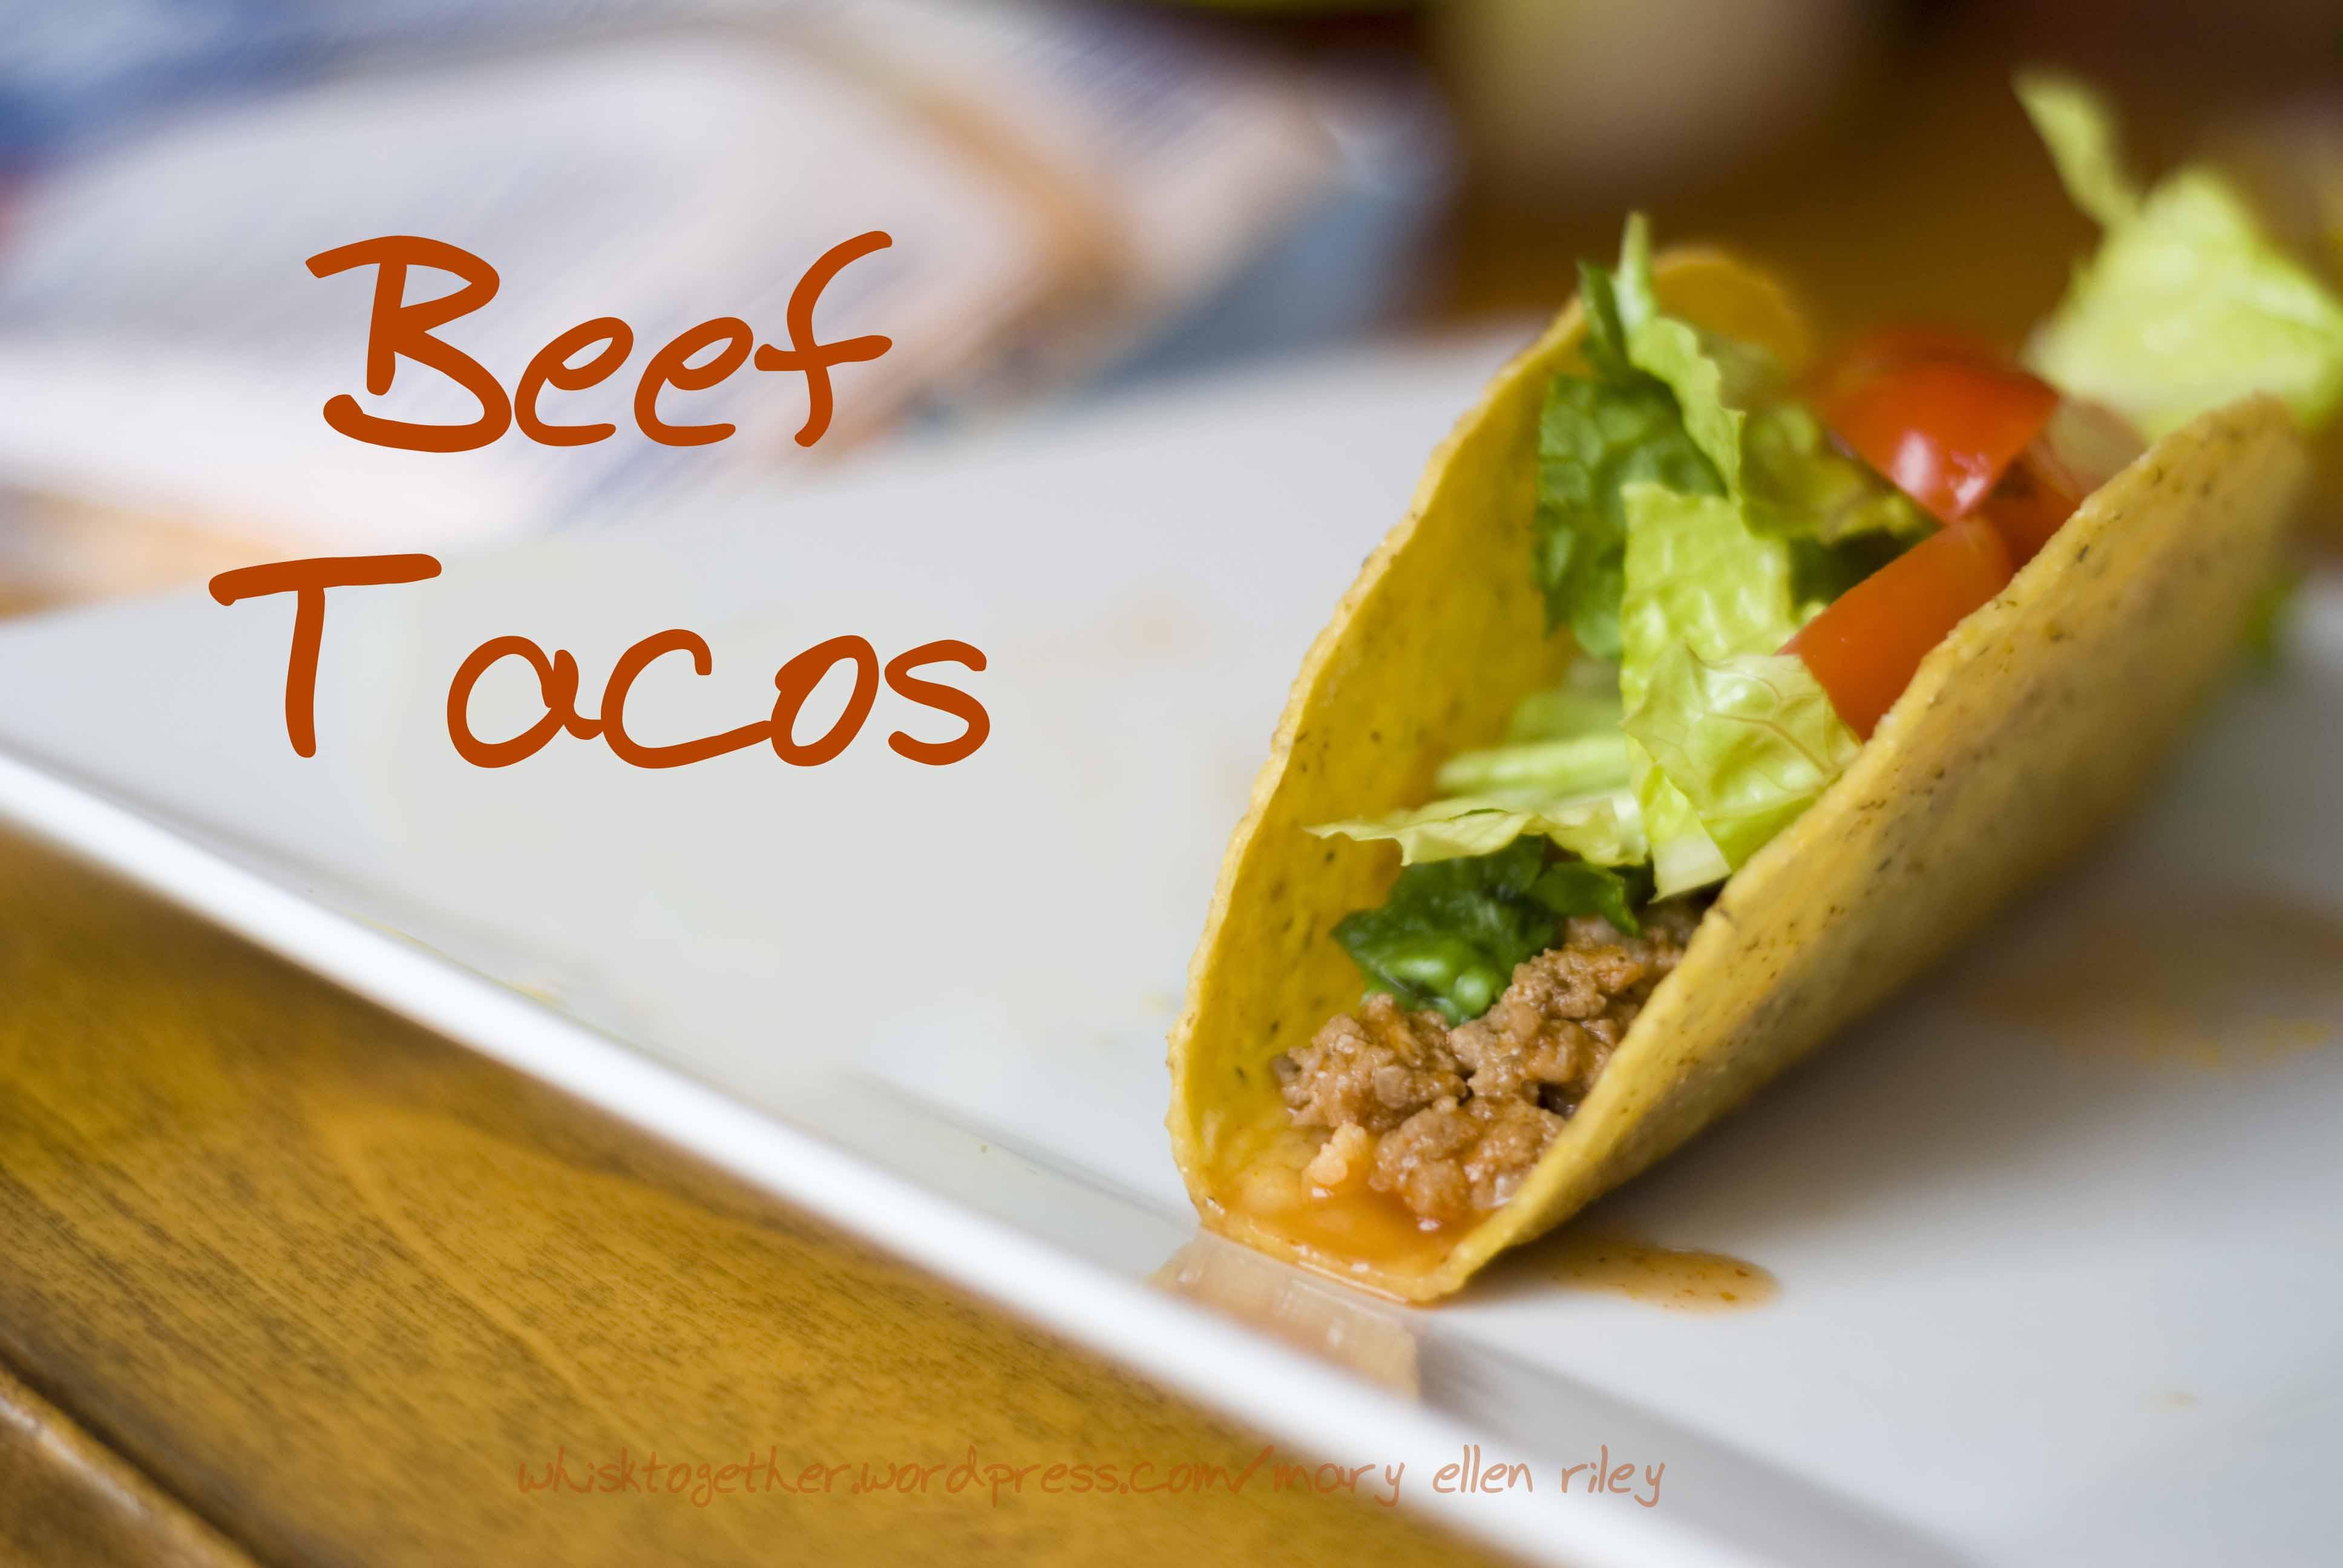 Taco_2CR